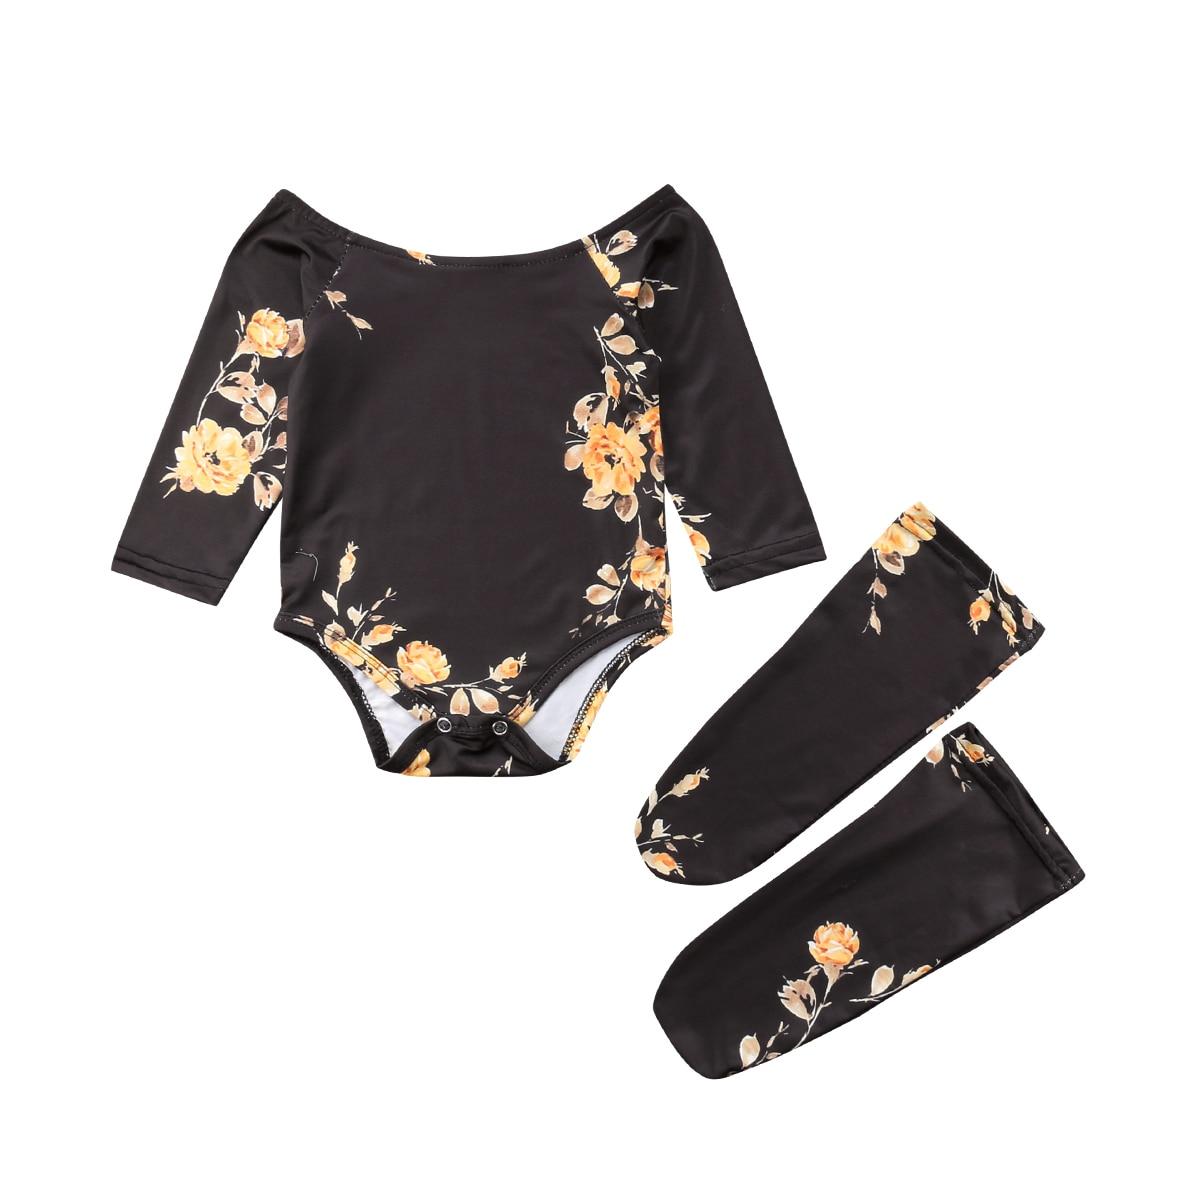 Bereidwillig 2018 Baby Meisje Zuigeling Off Shoulder Bloem Goud Zwarte Bloem Bodysuit Jumpsuit + Beenwarmers Outfits Herfst Kleding Comfortabel Gevoel